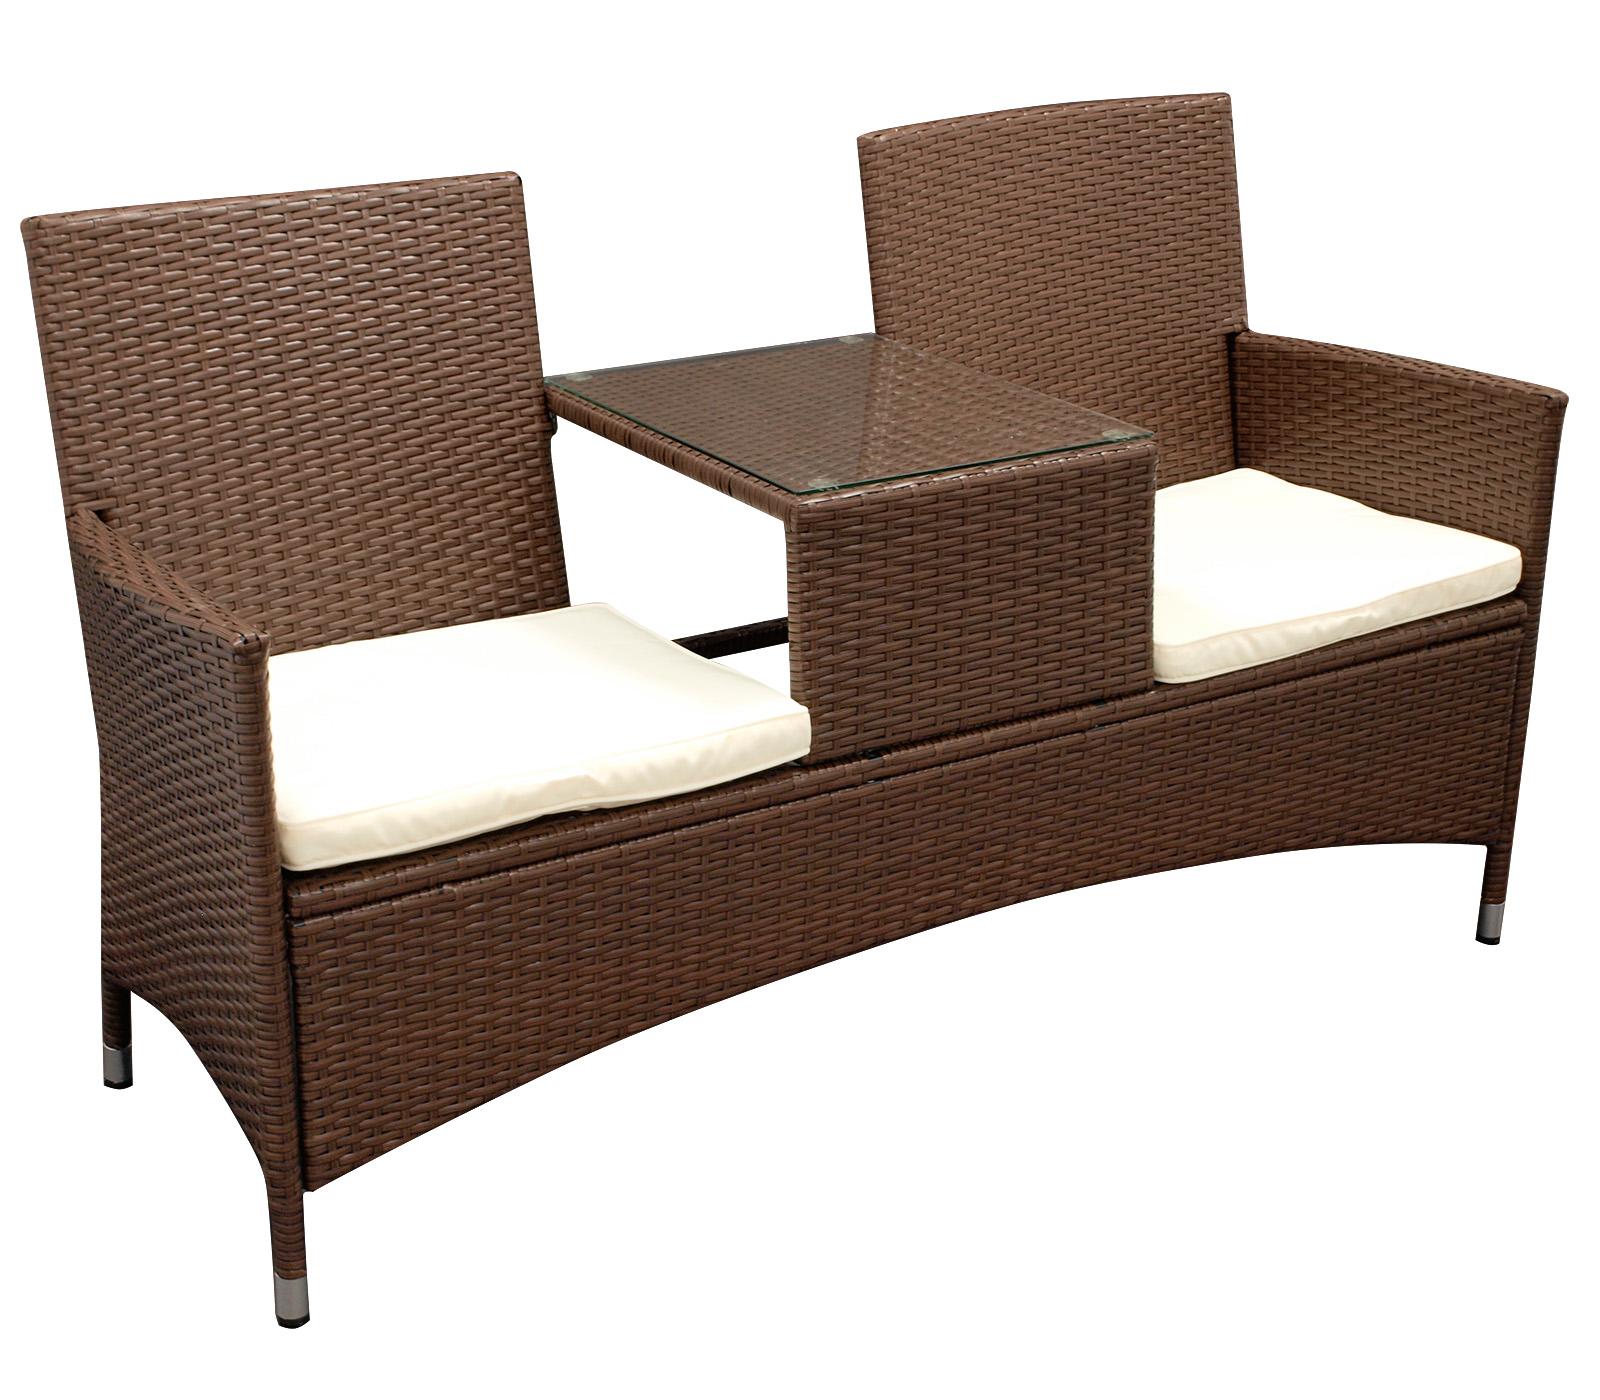 gartenbank rattanbank mit tisch gartenm bel bank san. Black Bedroom Furniture Sets. Home Design Ideas